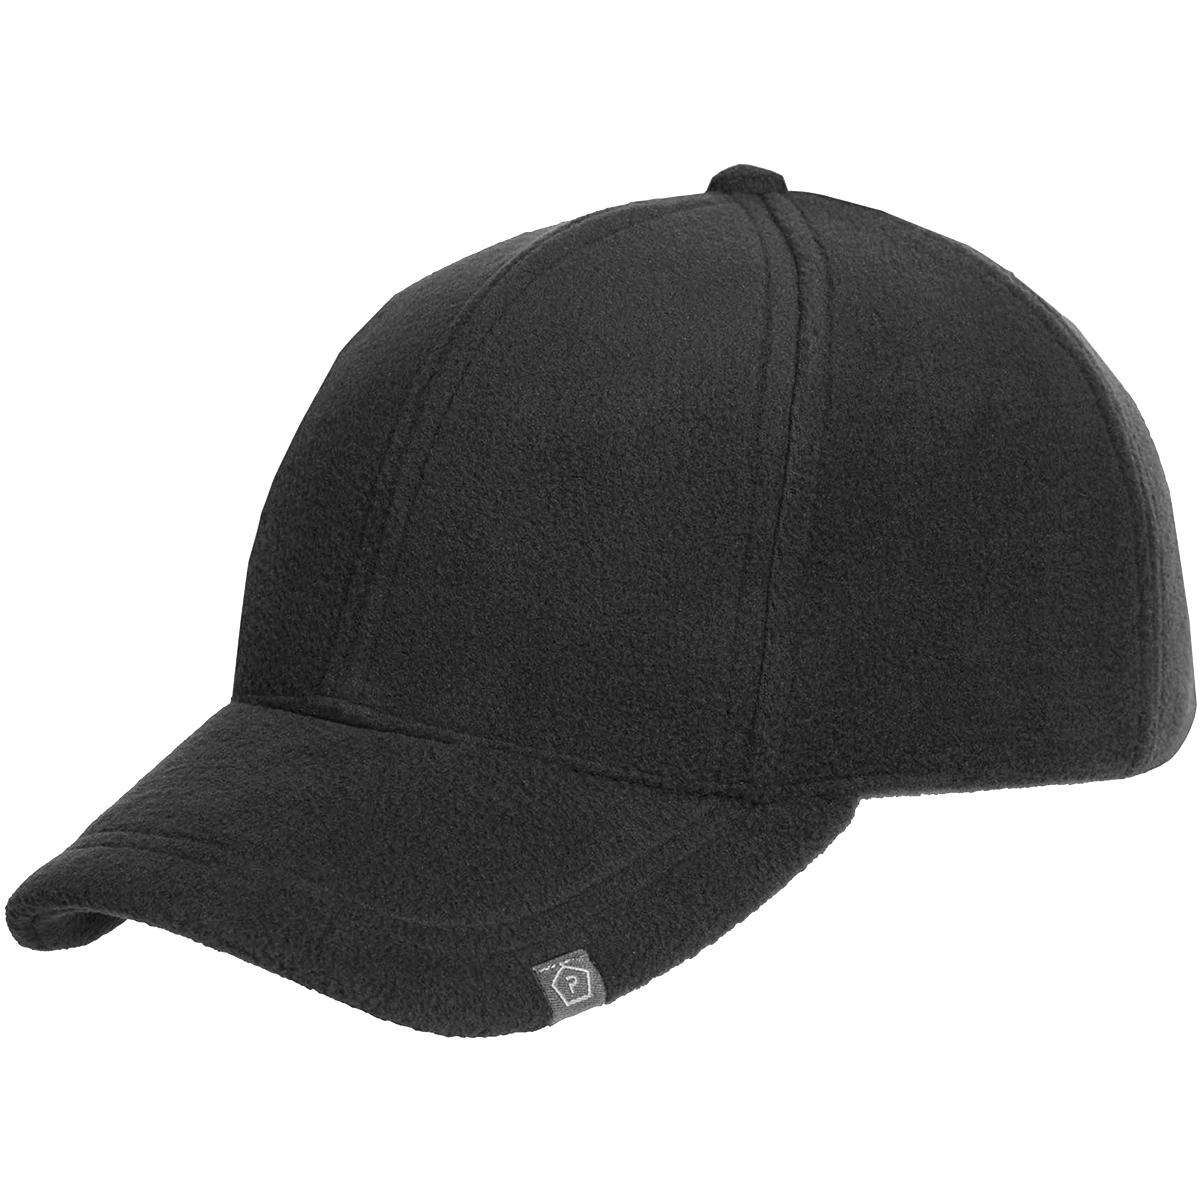 Pentagon Fleece BB Cap Security Baseball Hat Warm Police Patrol Headgear Black